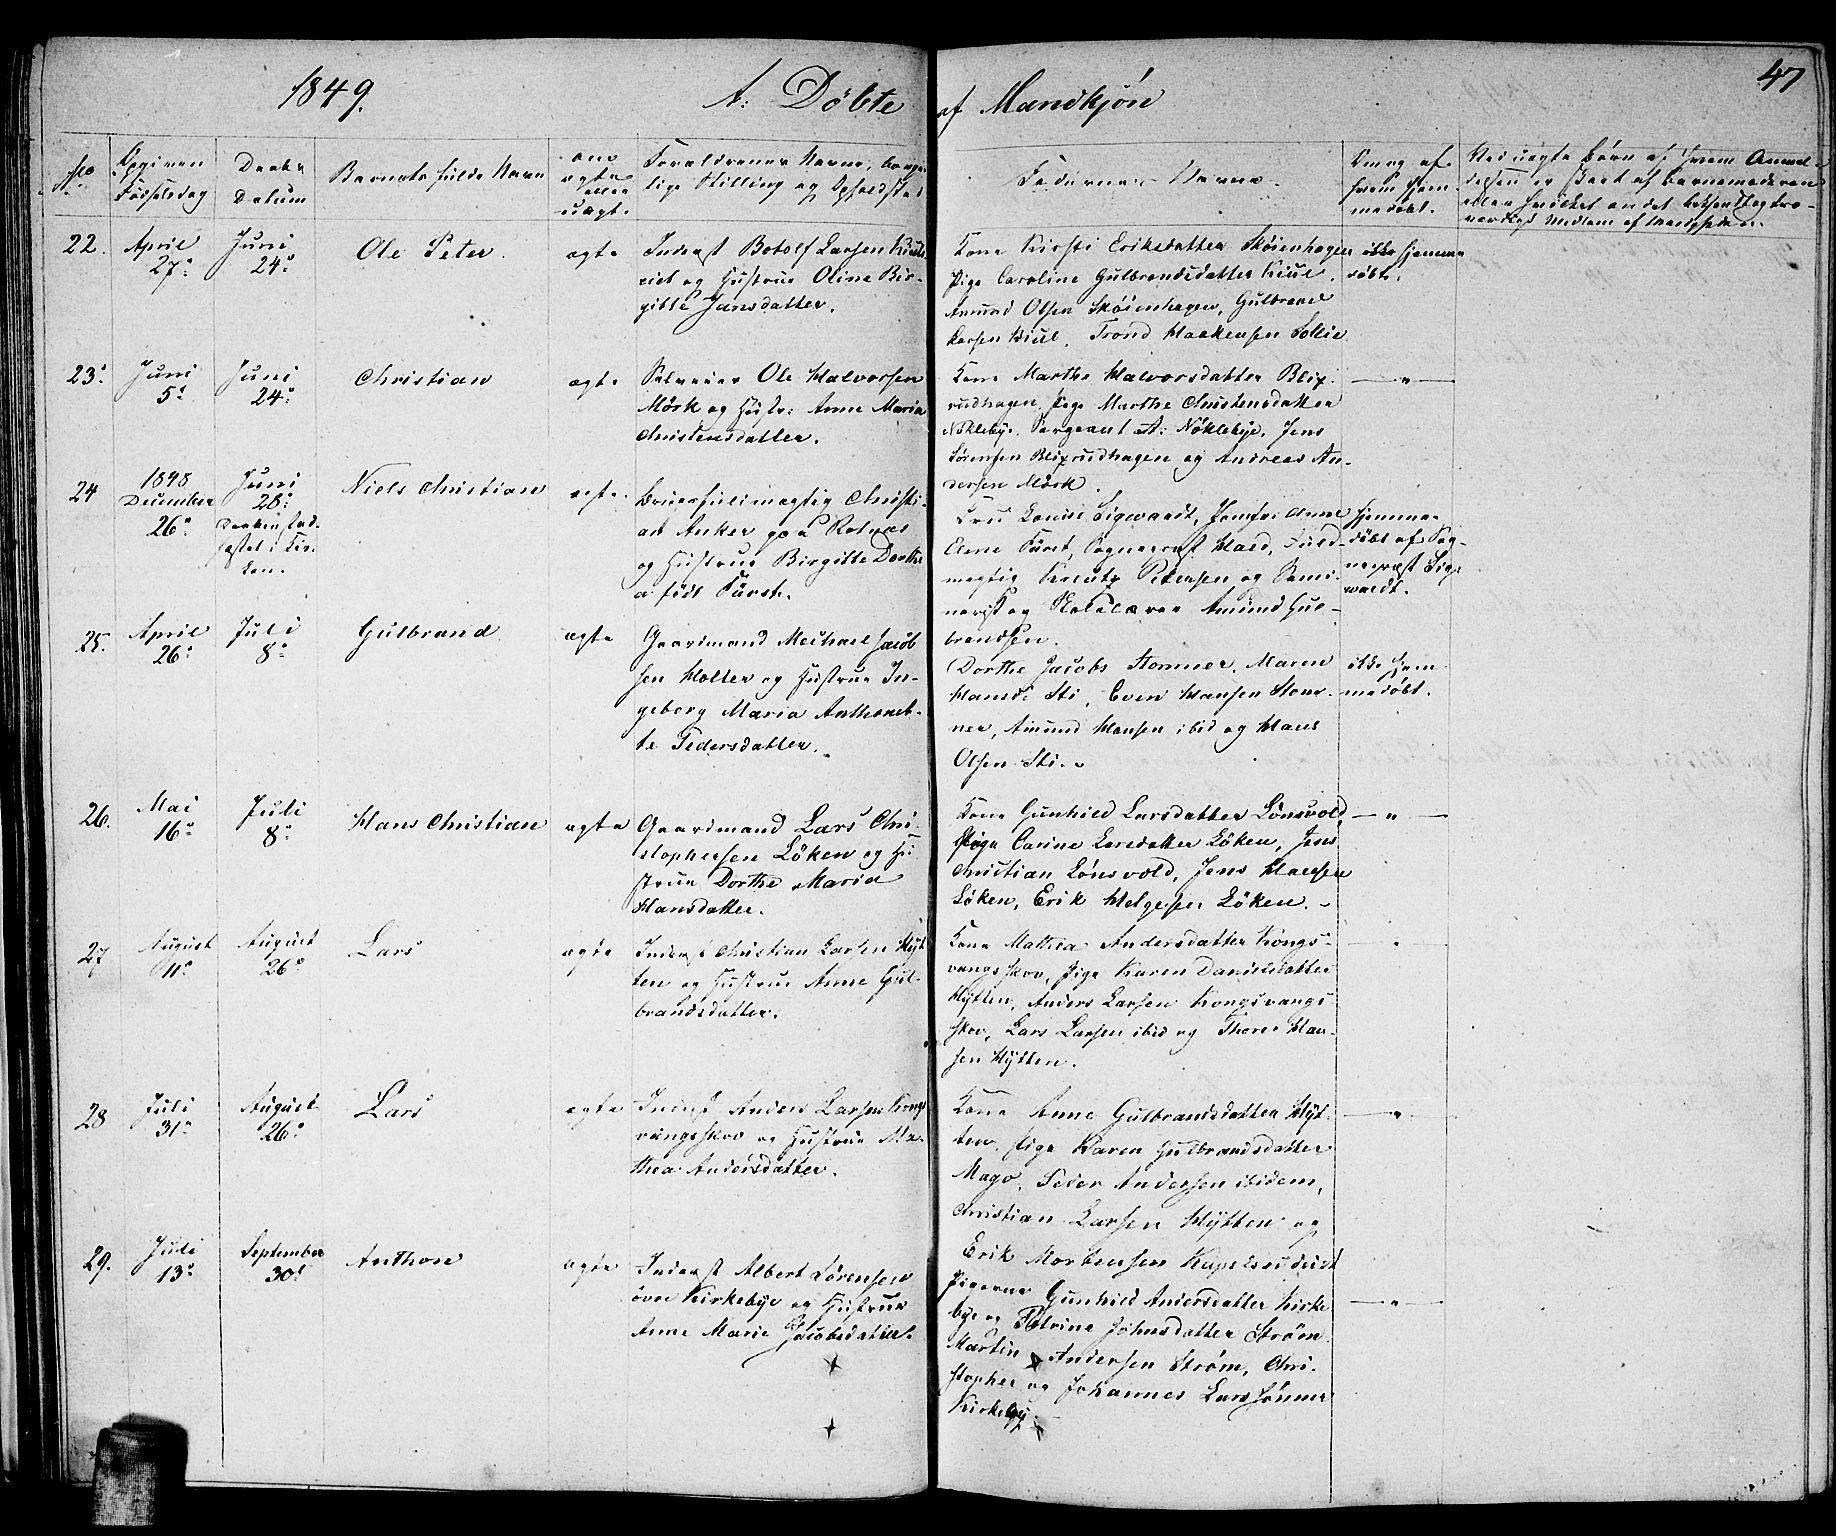 SAO, Nittedal prestekontor Kirkebøker, F/Fa/L0004: Ministerialbok nr. I 4, 1836-1849, s. 47